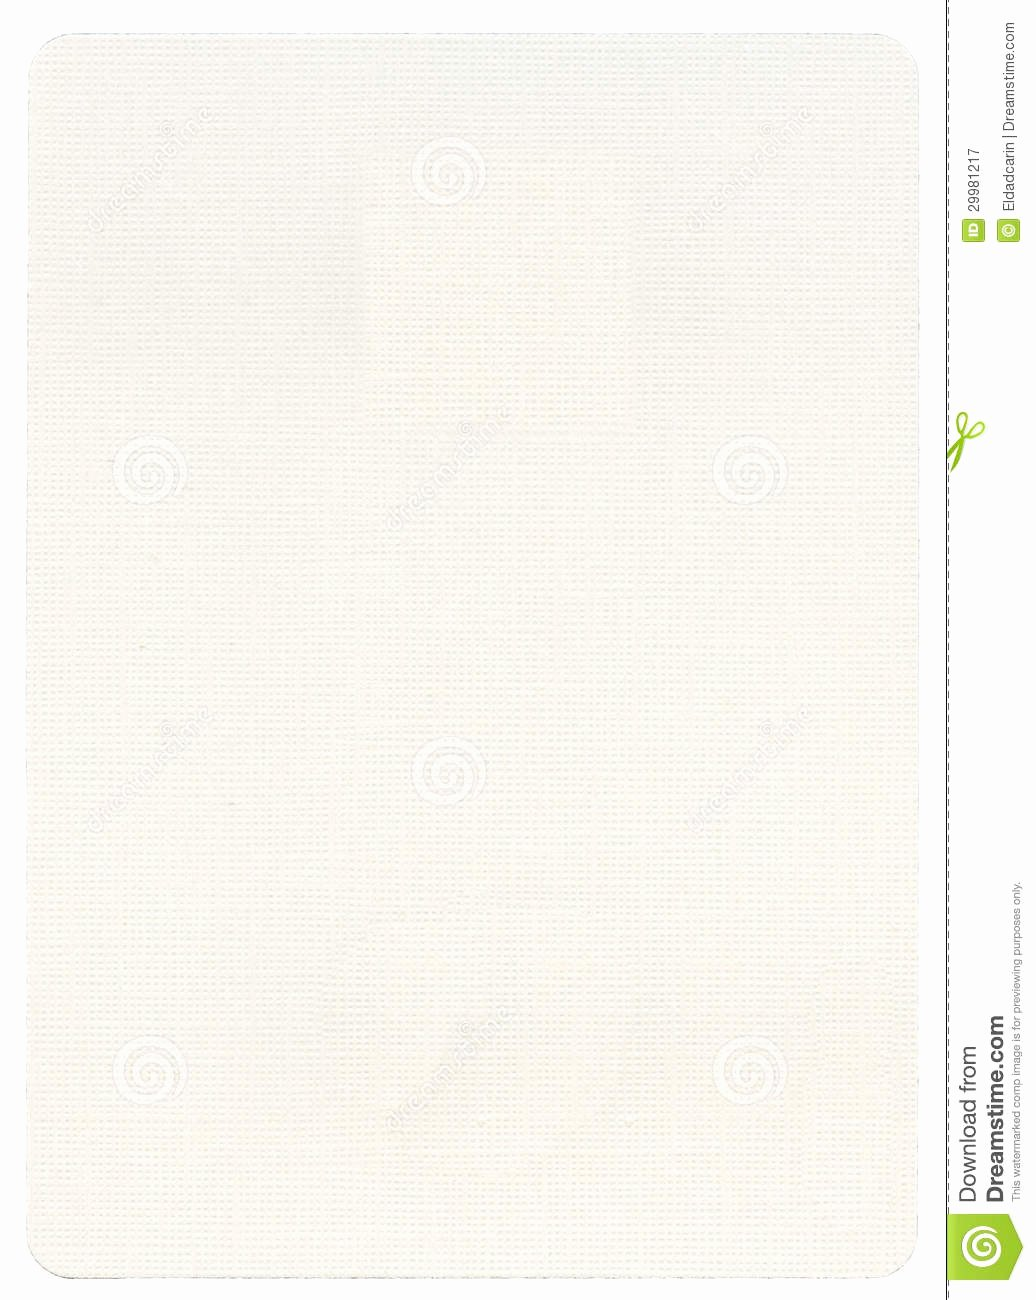 Printable Blank Playing Cards Elegant Playing Card Blank Stock Image Image Of Bridge